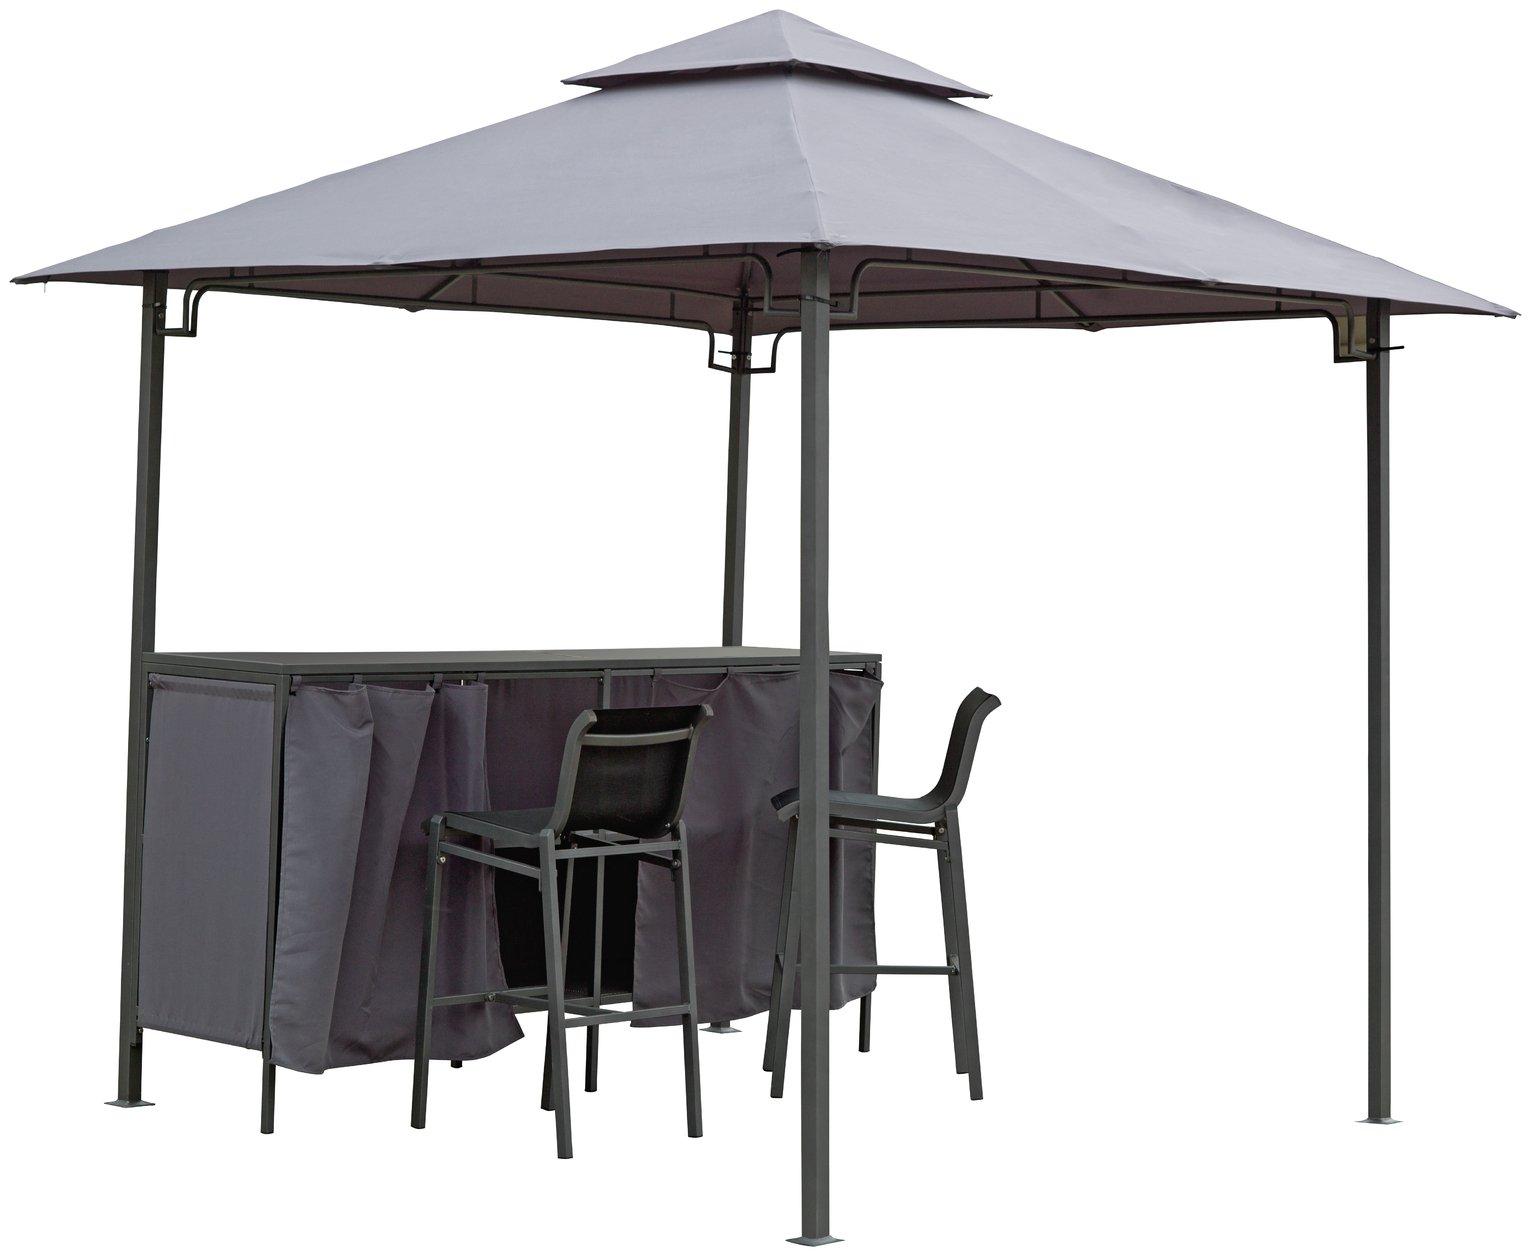 portable chairs argos brown club chair garden table sets dining patio home bar gazebo set